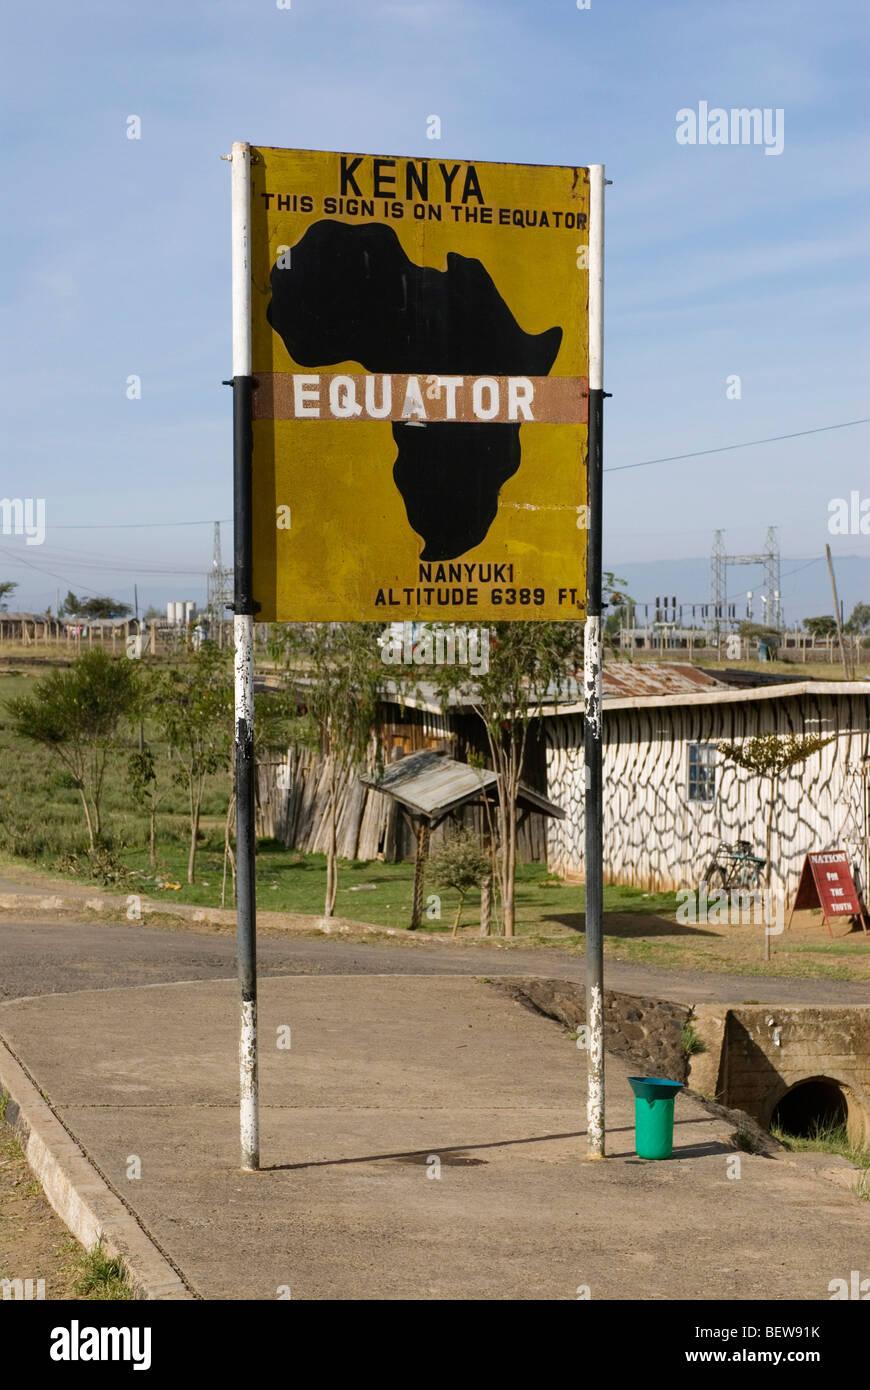 Sign on the equator, Nanyuki, Kenya - Stock Image